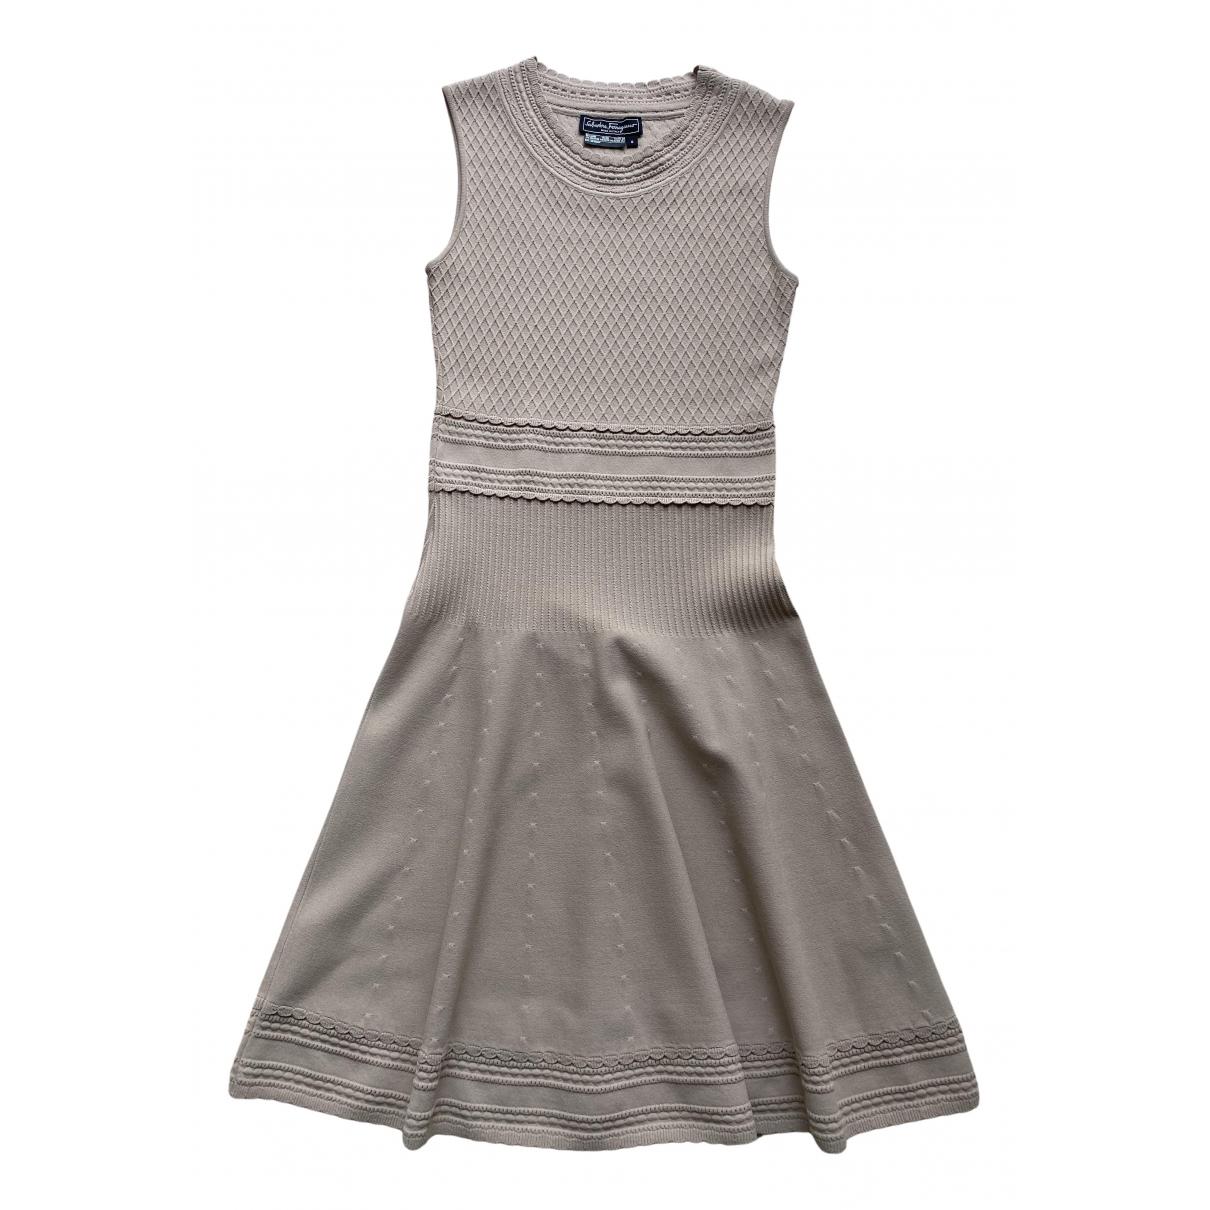 Salvatore Ferragamo \N Kleid in  Beige Synthetik